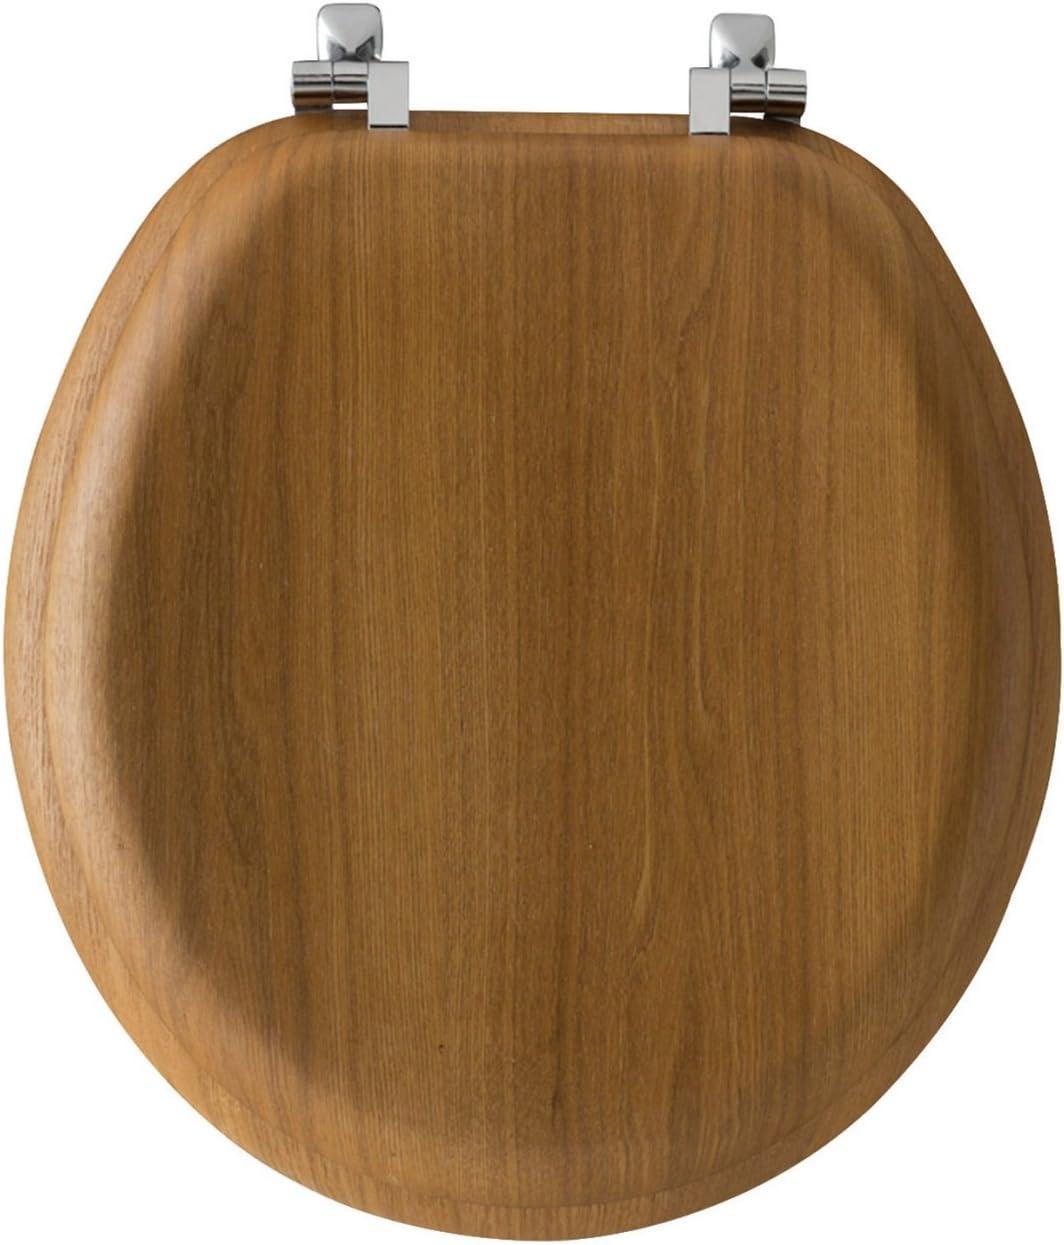 TOILET SEAT RND OAK VNR mart BEMIS 9601CP-263 Limited price by MfrPartNo